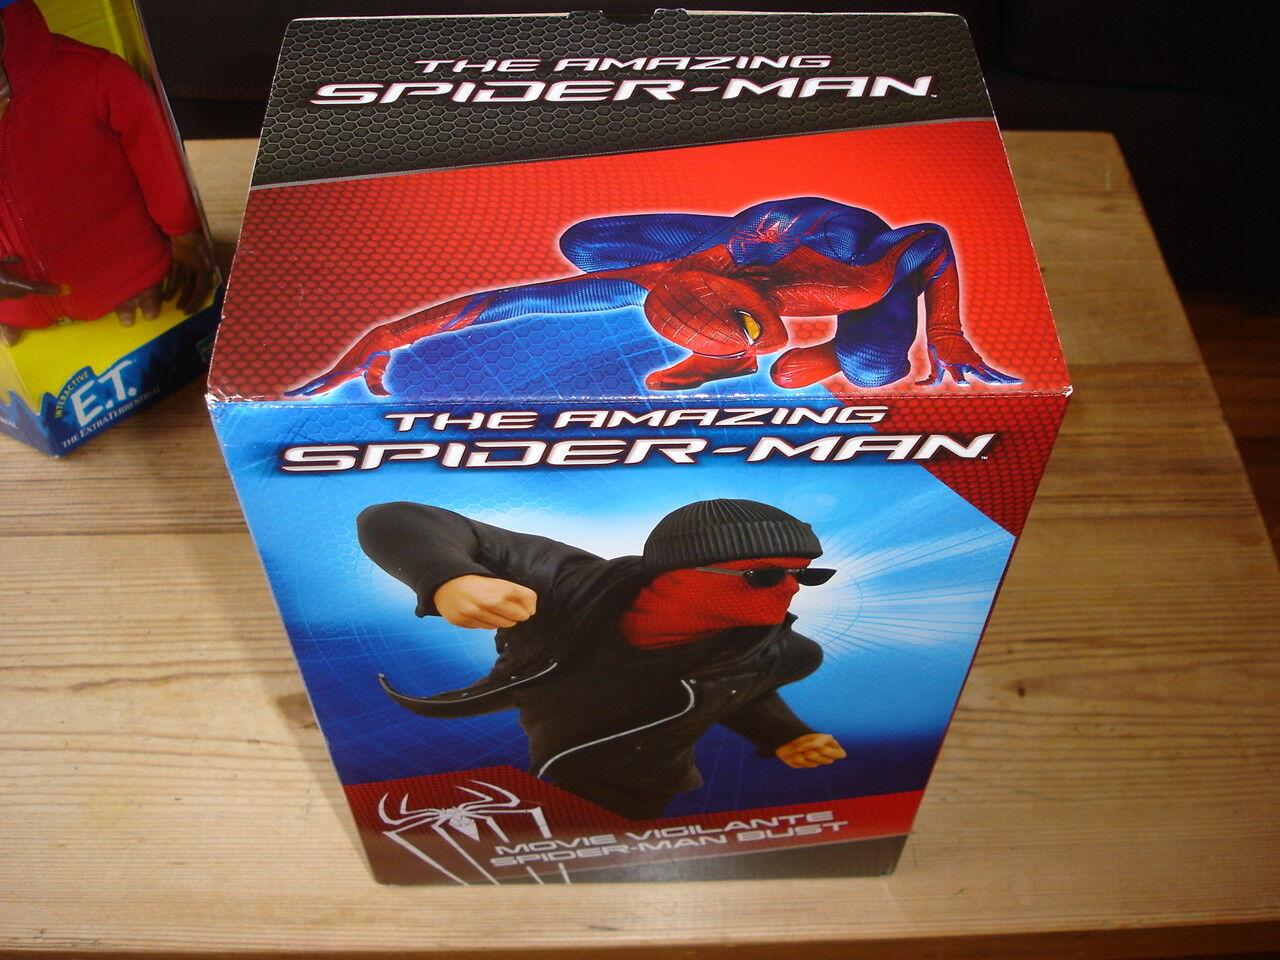 Amazing Spider-Man Vigilante Bust - Diamond Select - - - New - spiderman  262 2012 30c351